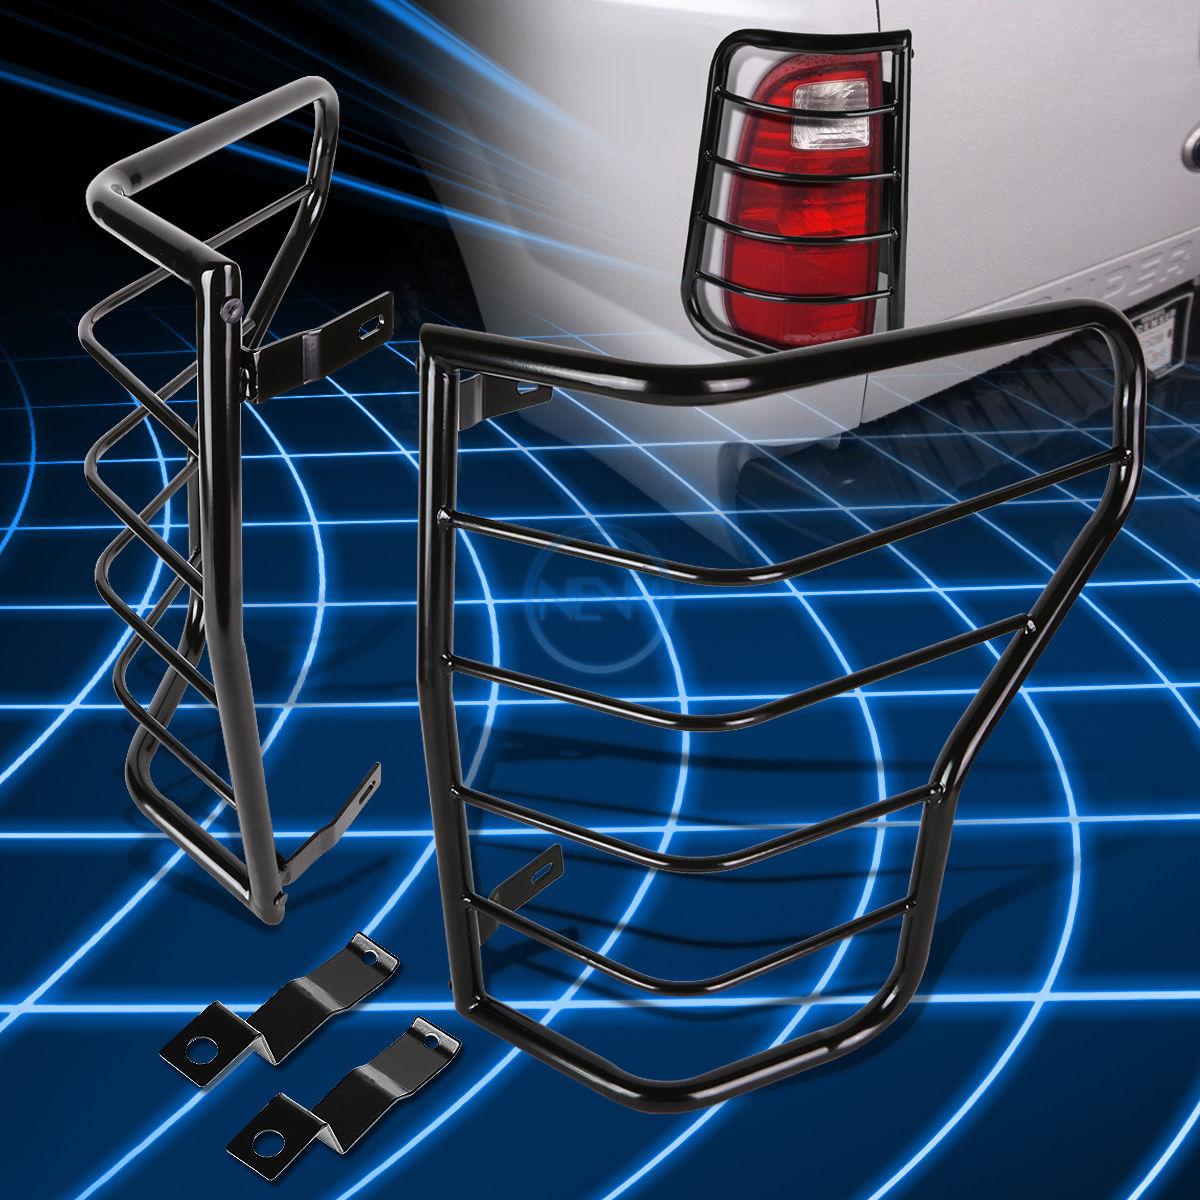 US ライトガード プロテクター 2007-2013トヨタトンドラピックアップのためのブラックスチールテールライトガードプロテクターカバー Black Steel Tail Light Guard Protector Cover for 2007-2013 Toyota Tundra Pickup